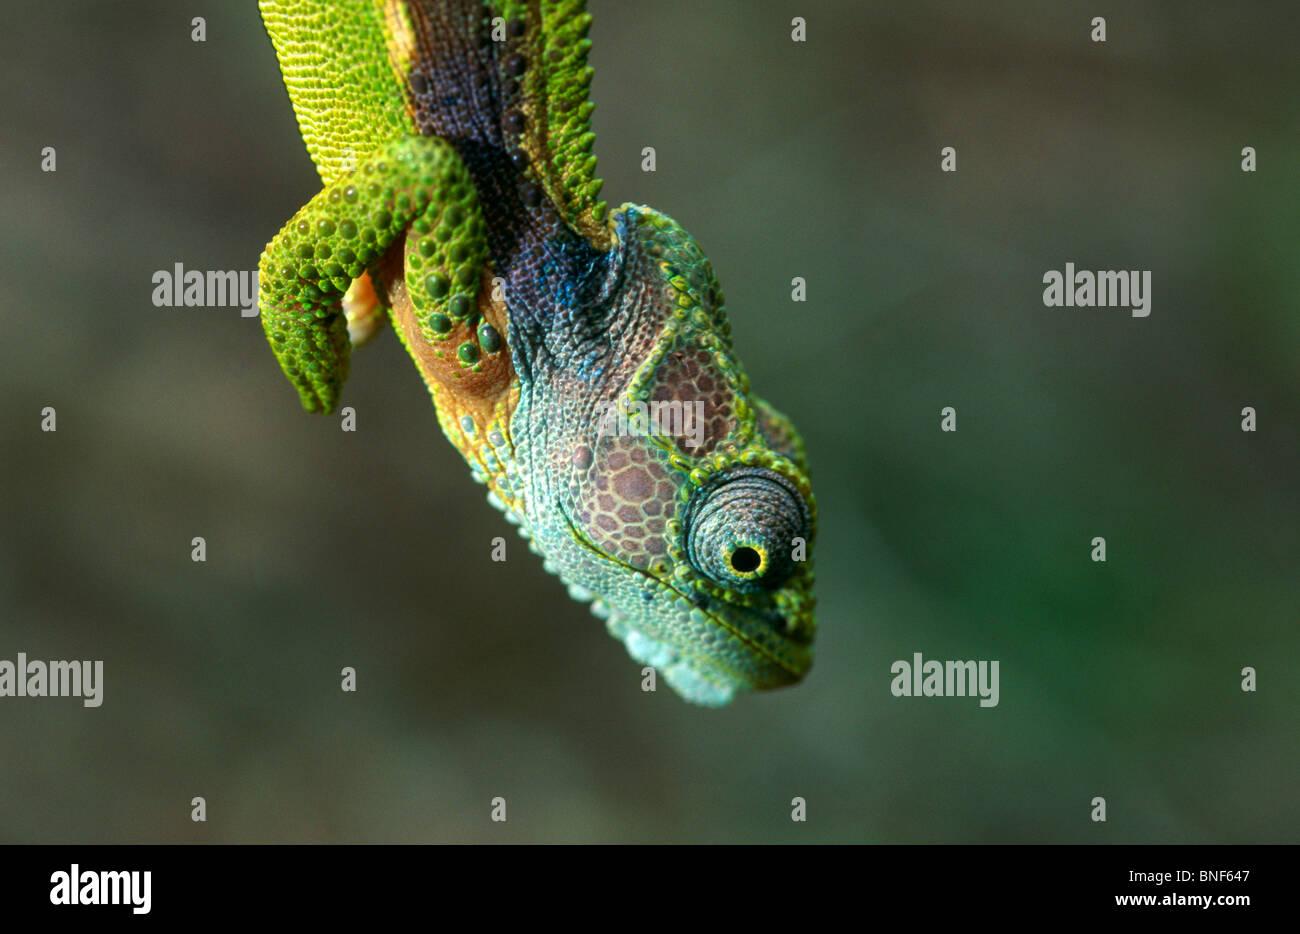 Vista de cerca de un camaleón enano meridional (Bradypodian ventrale),Parque Nacional Tsitsikamma Eastern Cape Imagen De Stock